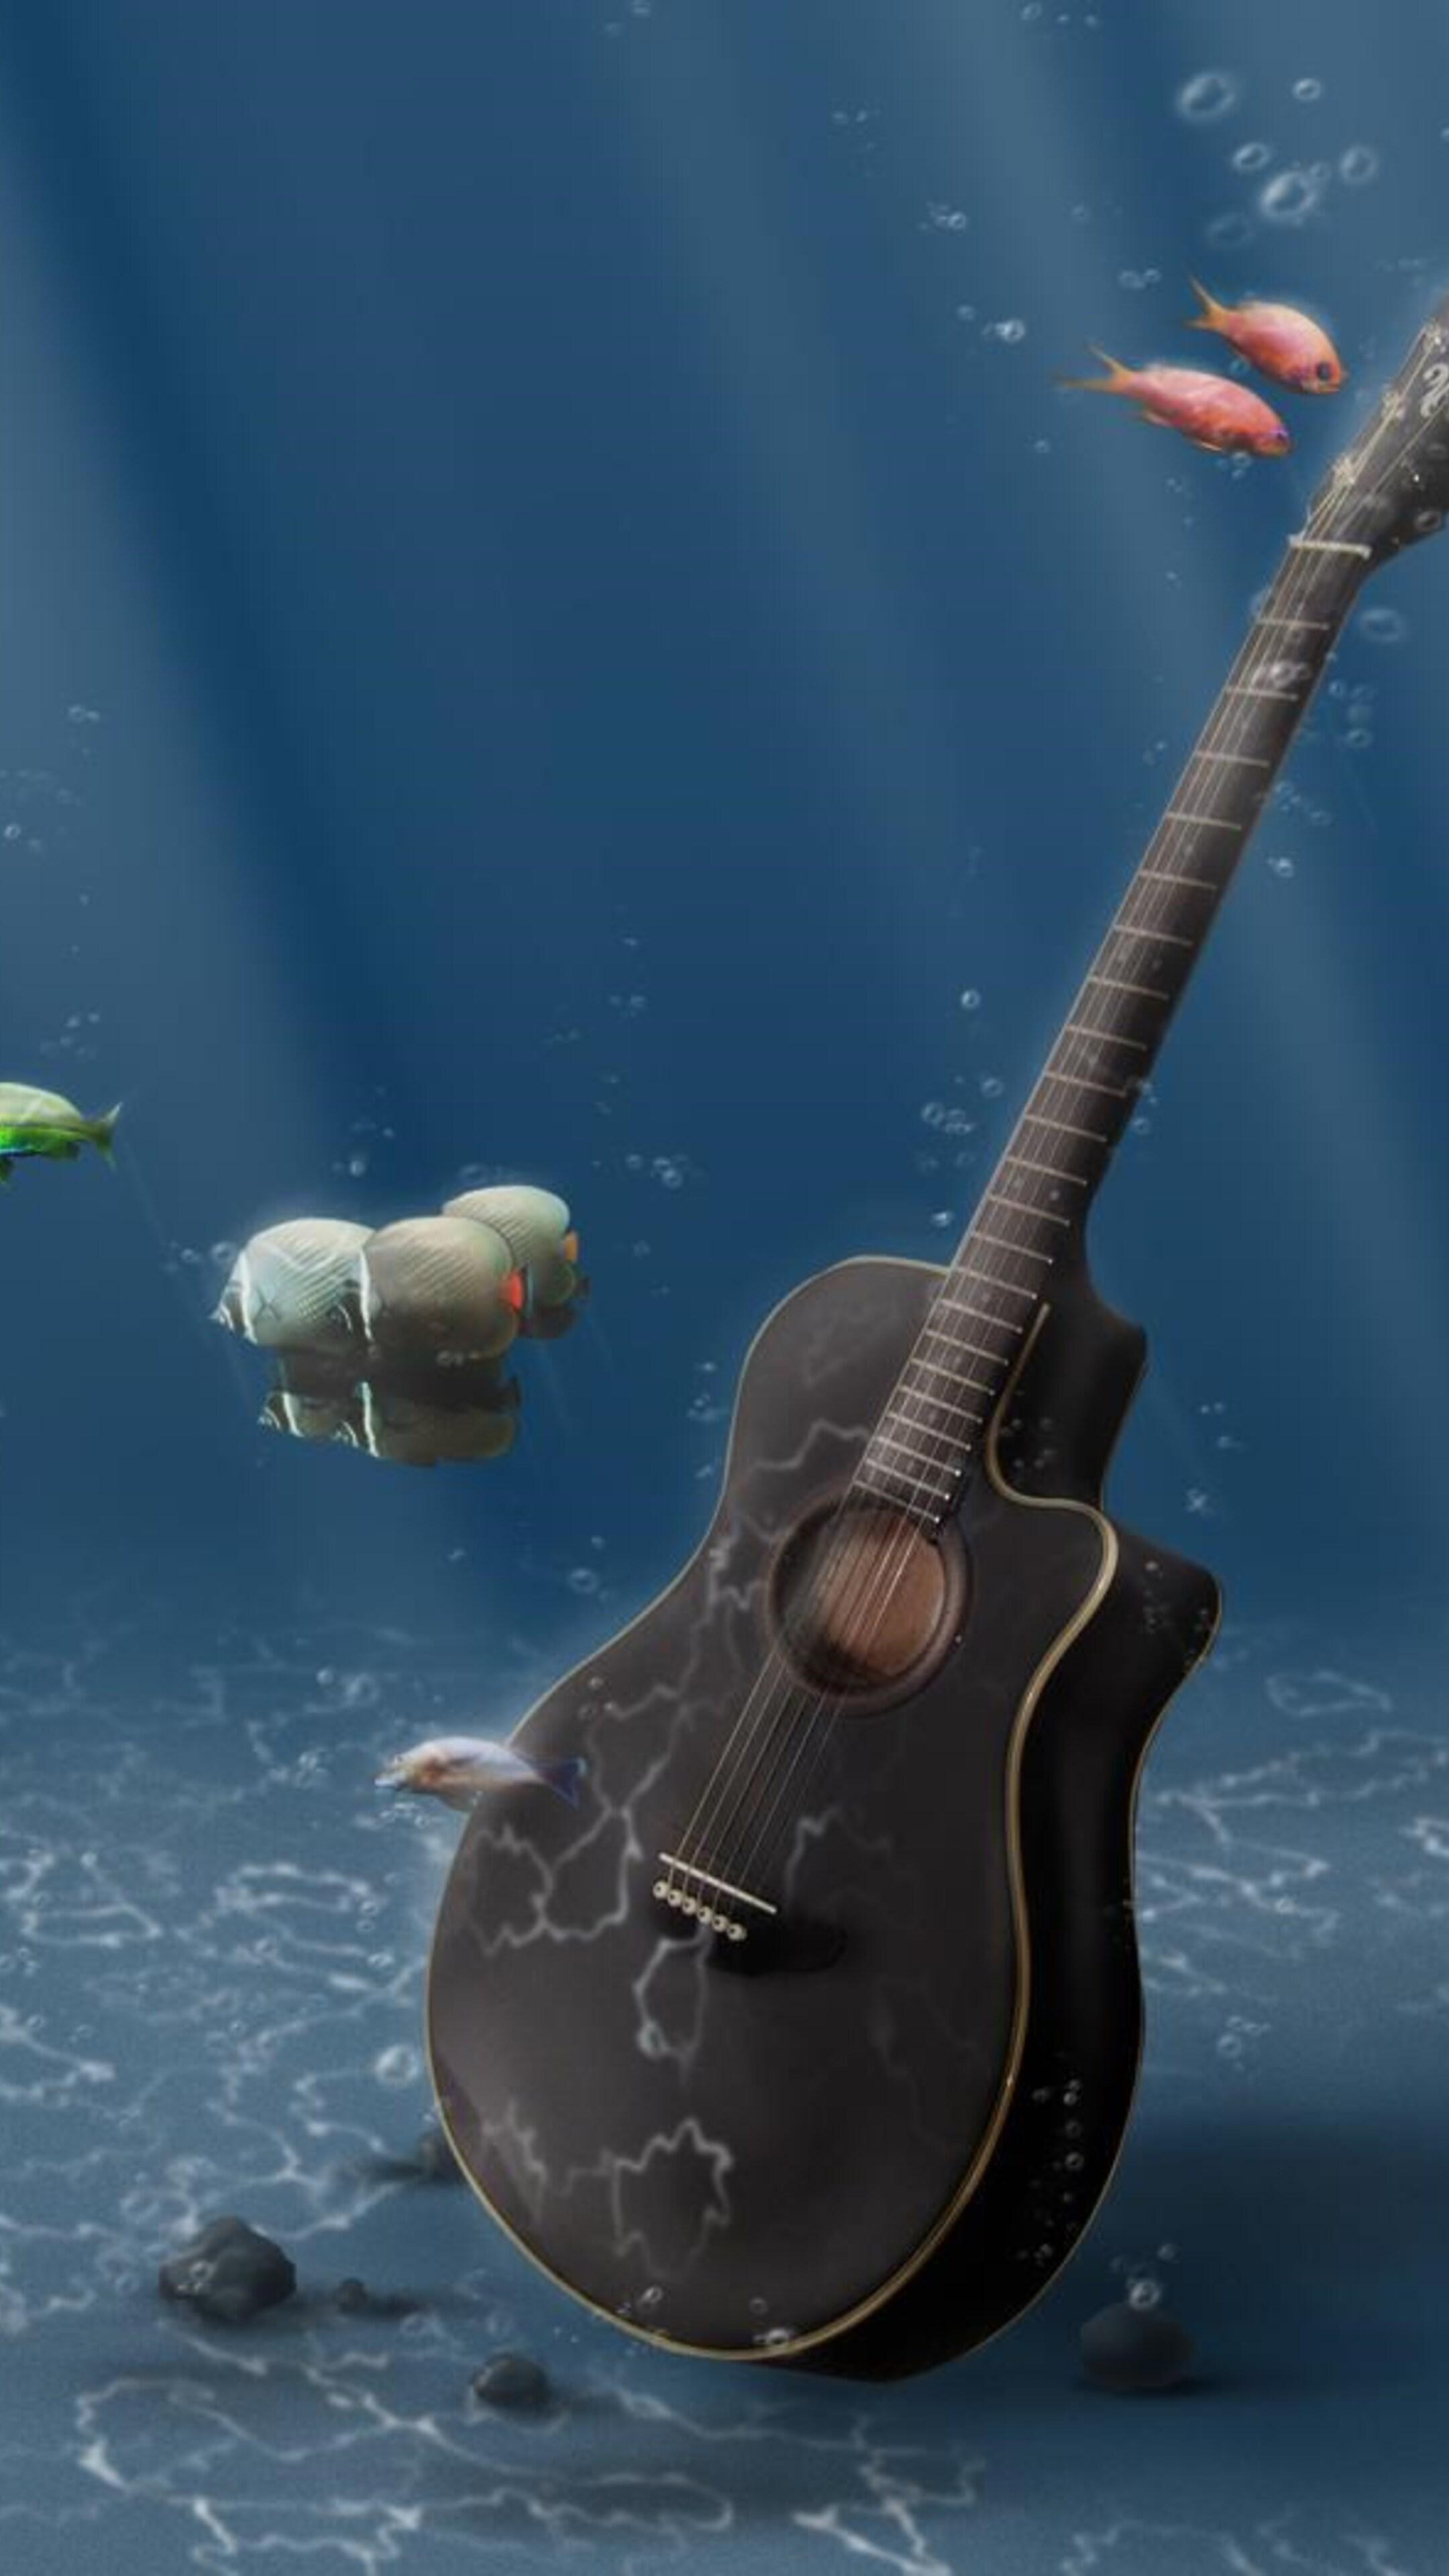 2160x3840 guitar digital art sony xperia x xz z5 premium - Art wallpaper 2160x3840 ...